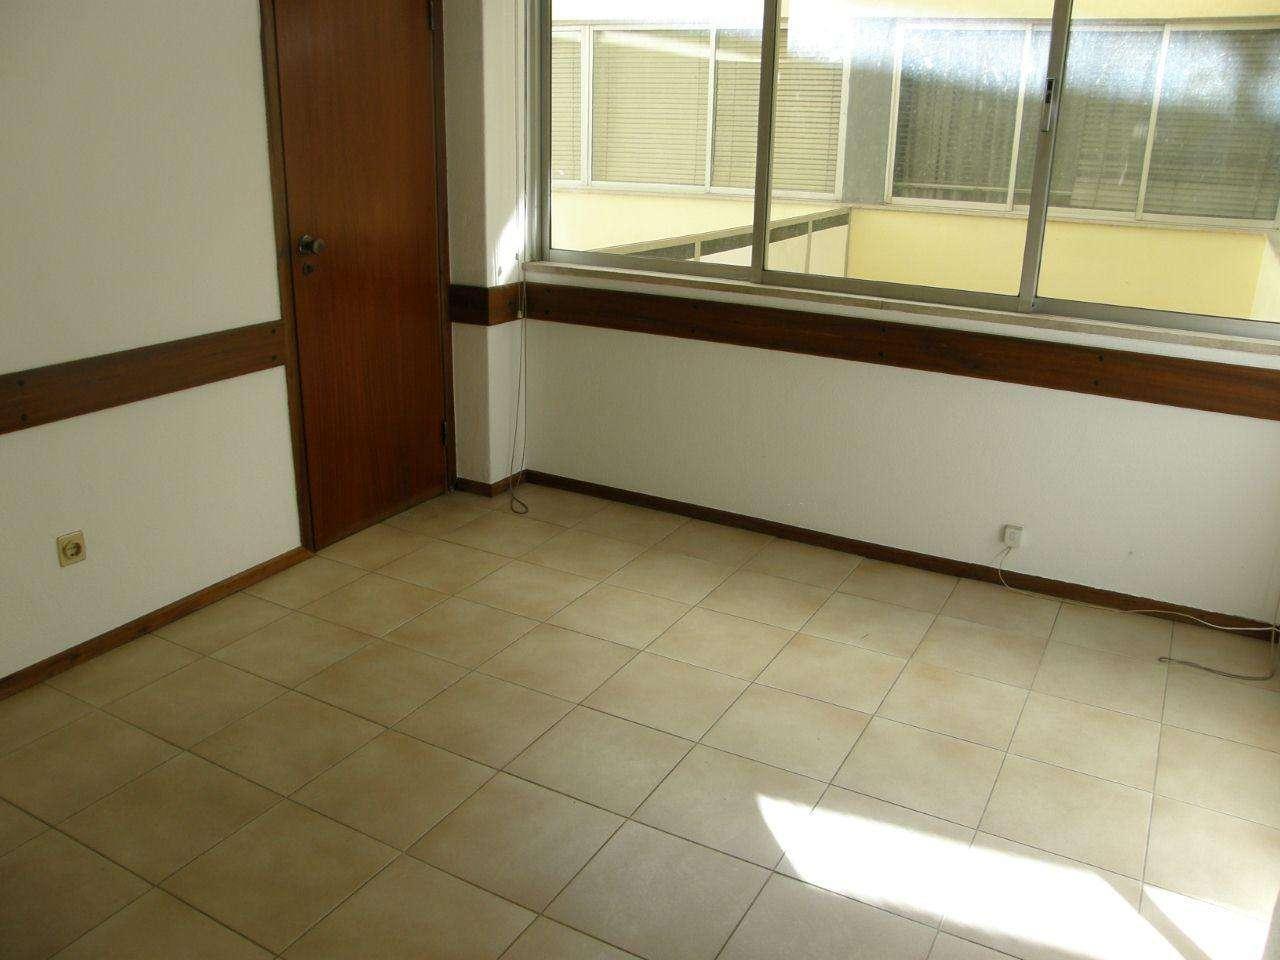 Escritório para arrendar, Leiria, Pousos, Barreira e Cortes, Leiria - Foto 5